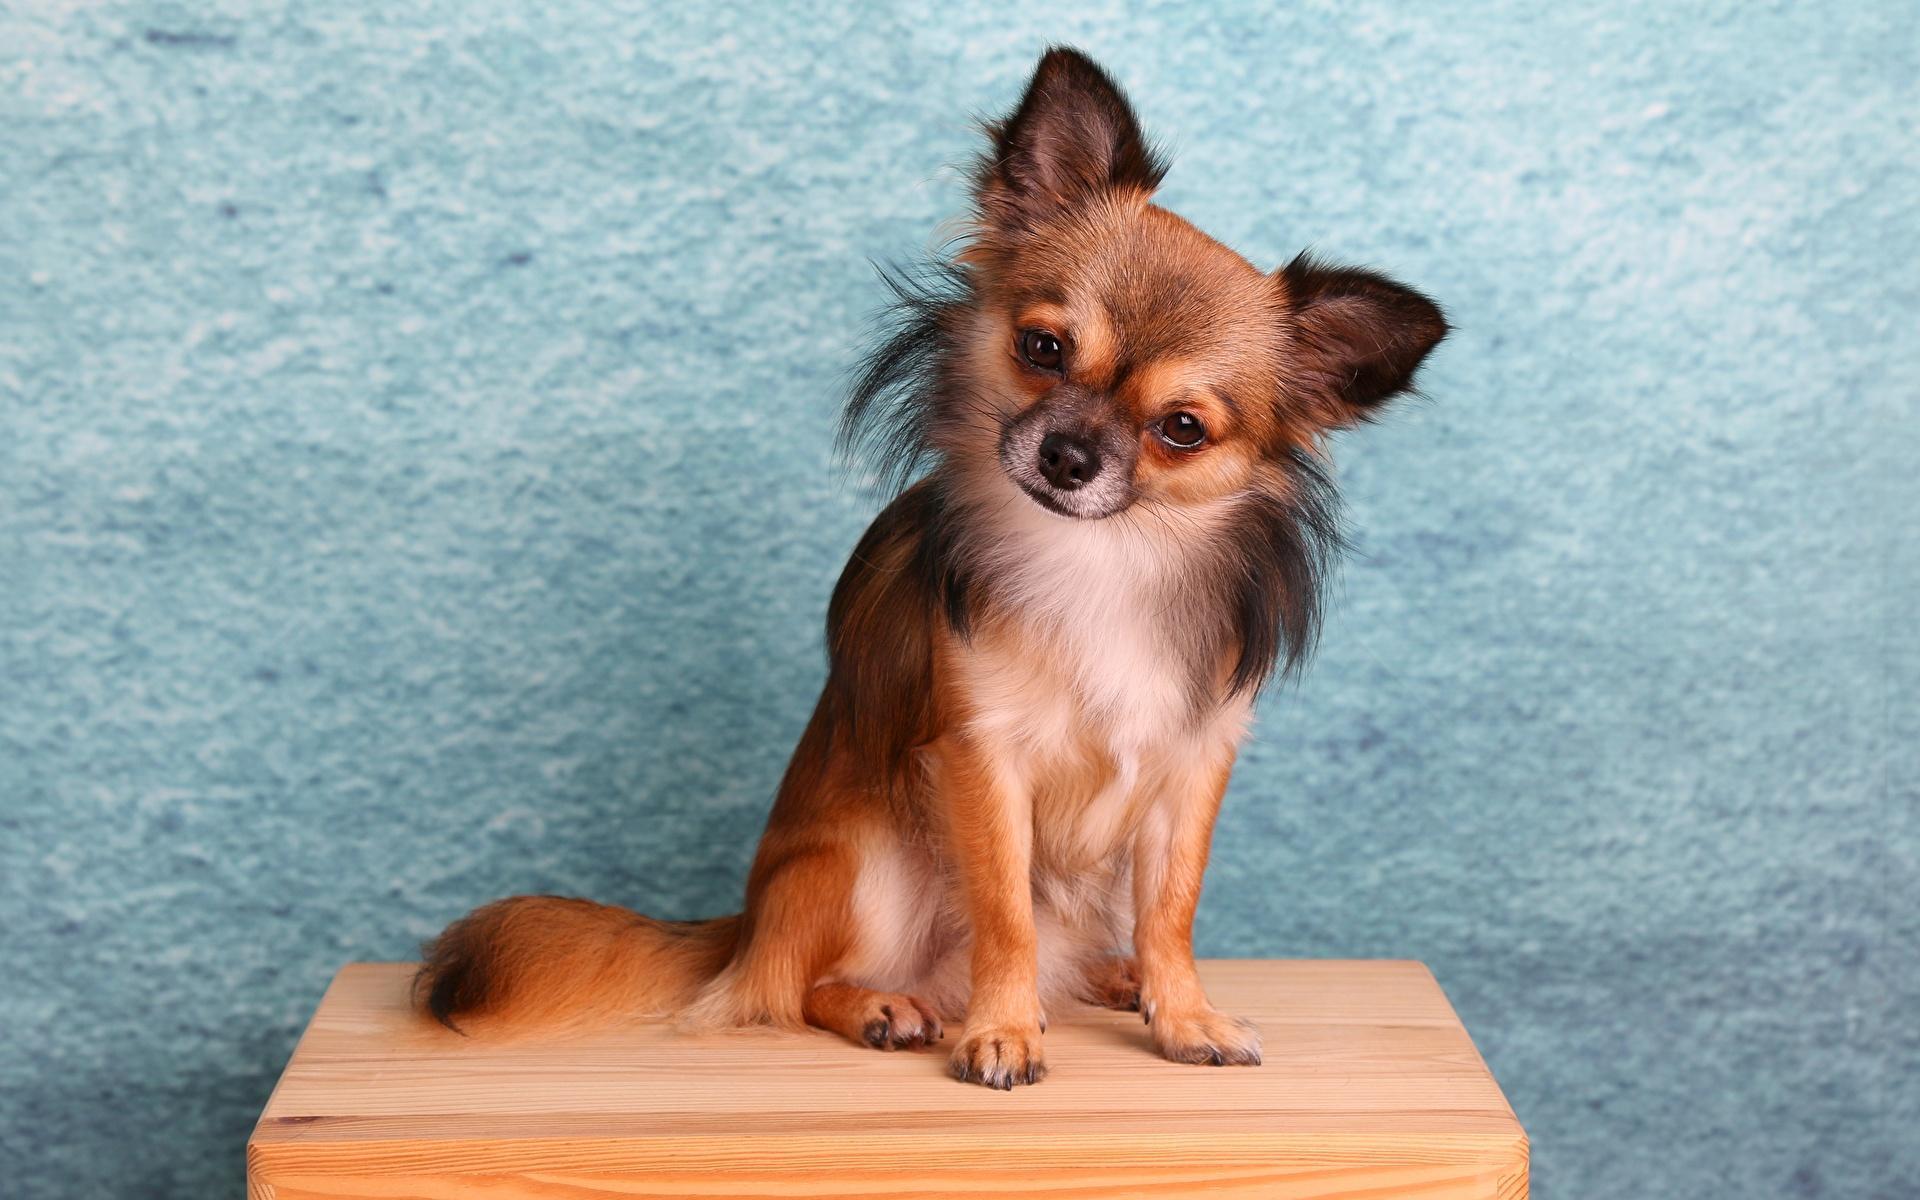 Картинки Чихуахуа Собаки сидя Животные 1920x1200 собака Сидит сидящие животное